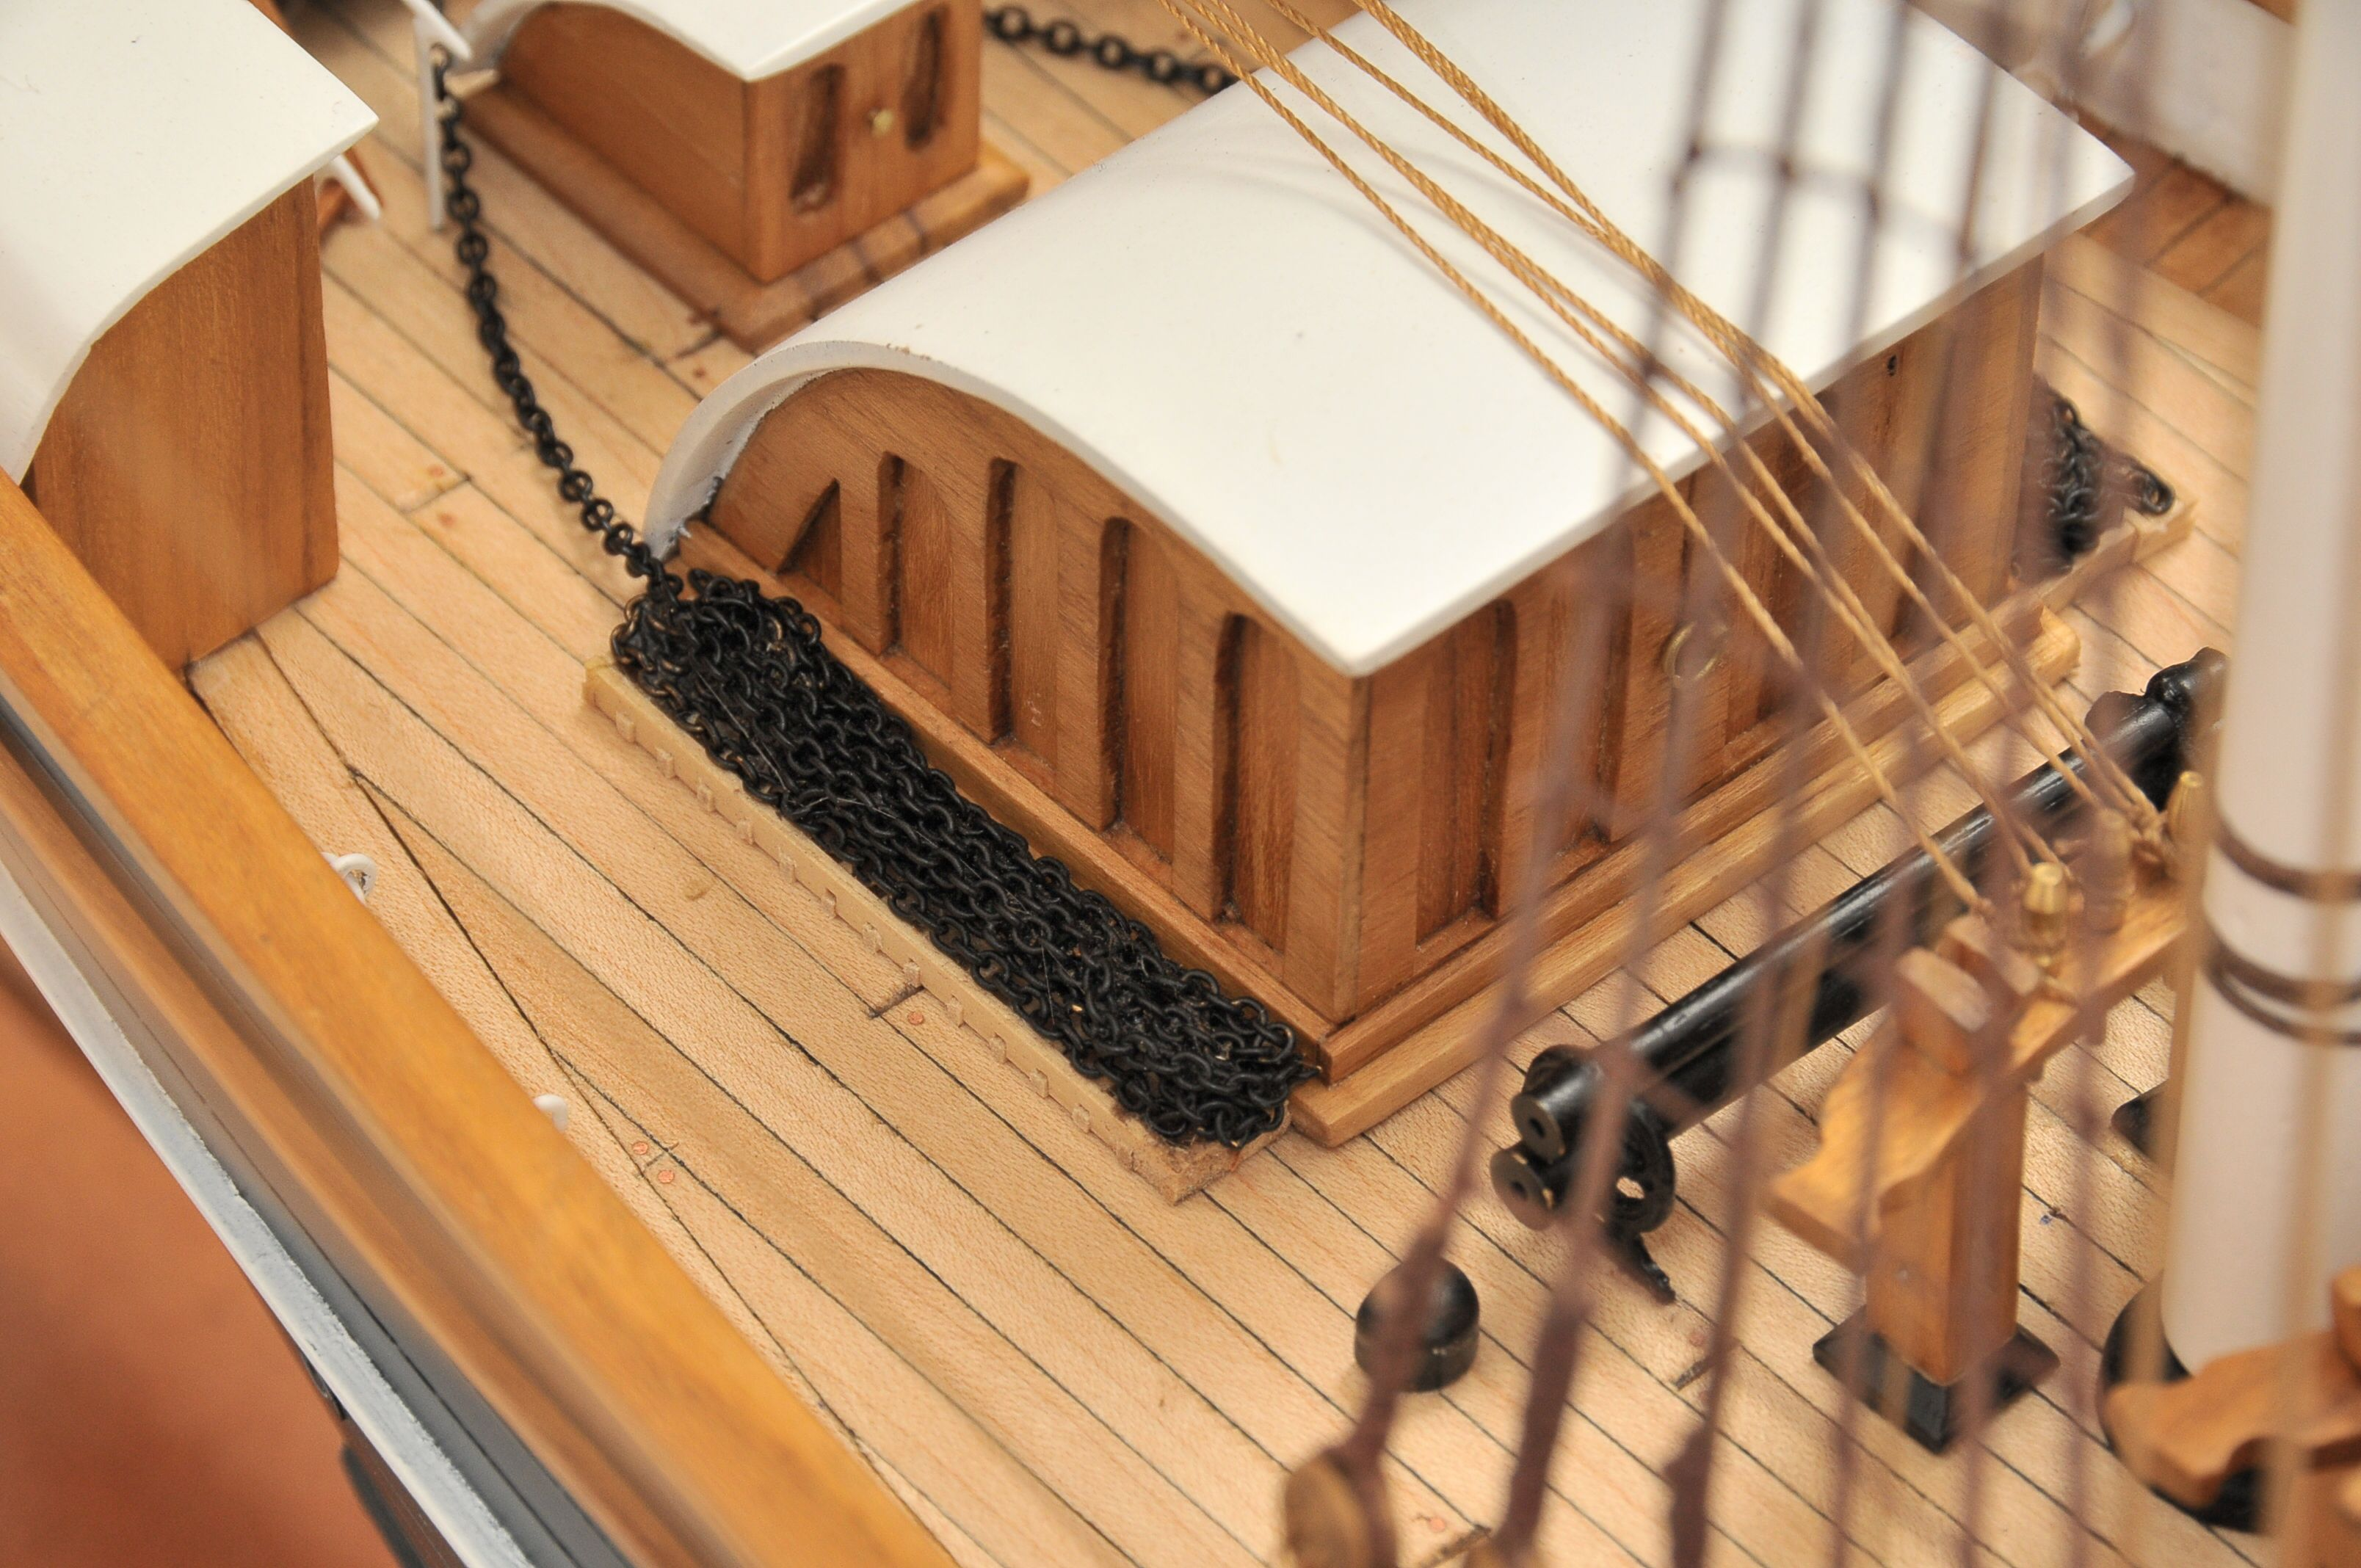 553-8678-Cutty-Sark-model-ship-Premier-Range